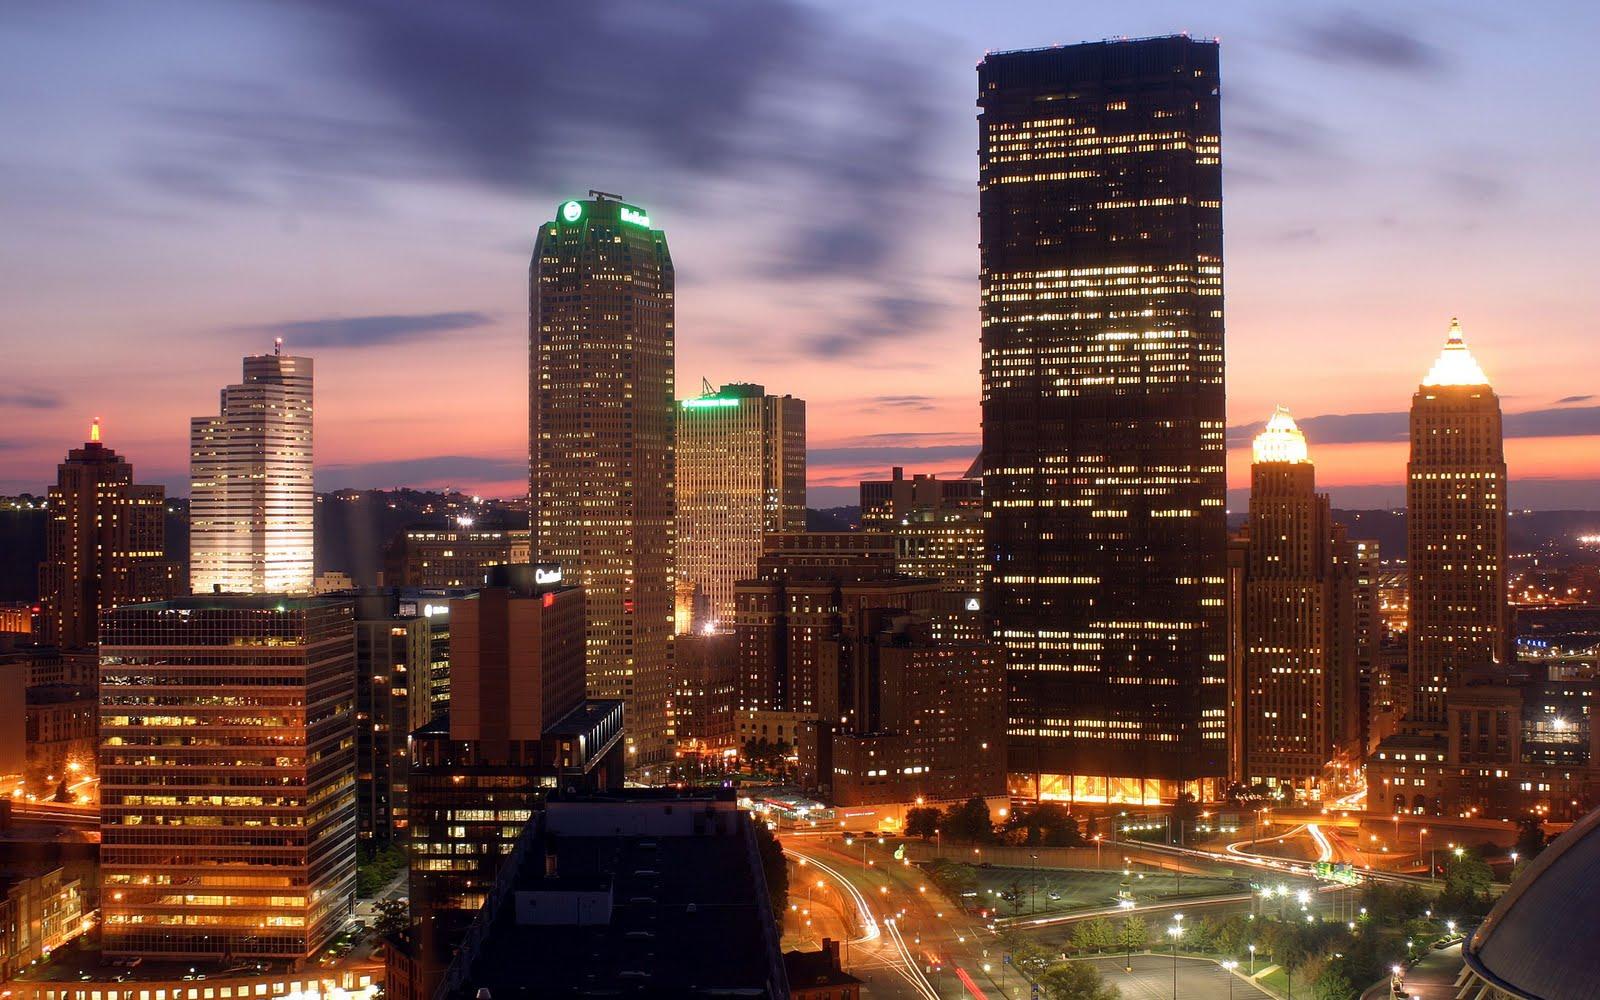 http://1.bp.blogspot.com/_2IU2Nt4rD1k/THZy7CrwFoI/AAAAAAAACBM/LF_YnifVRp8/s1600/wide_cityscape.jpg